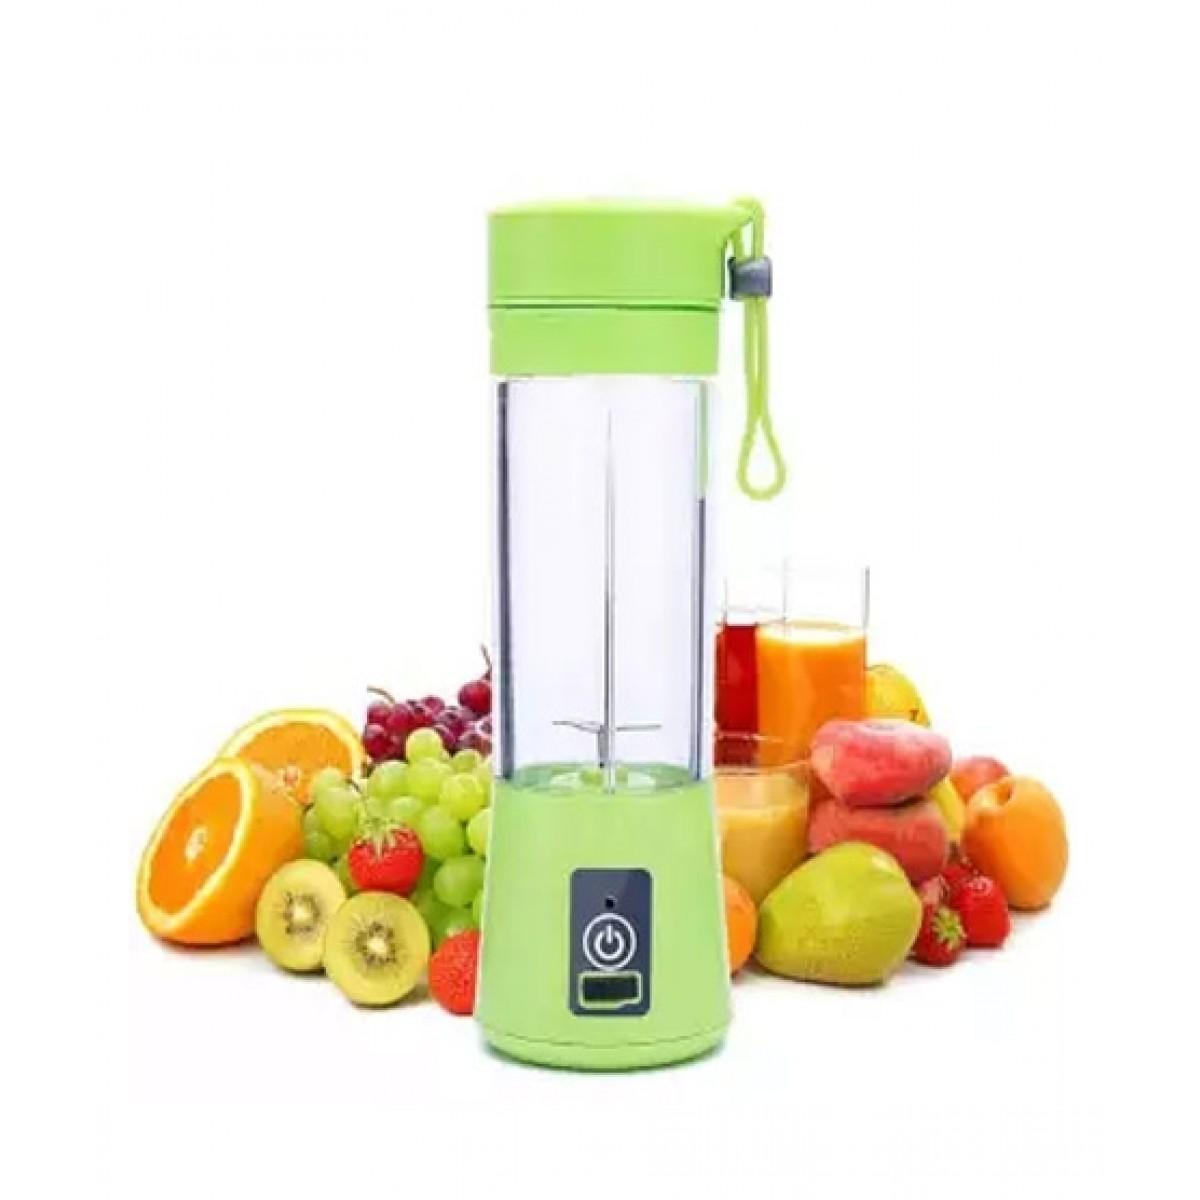 Caprio 1000mAh Rechargeable Juicer Blender Green